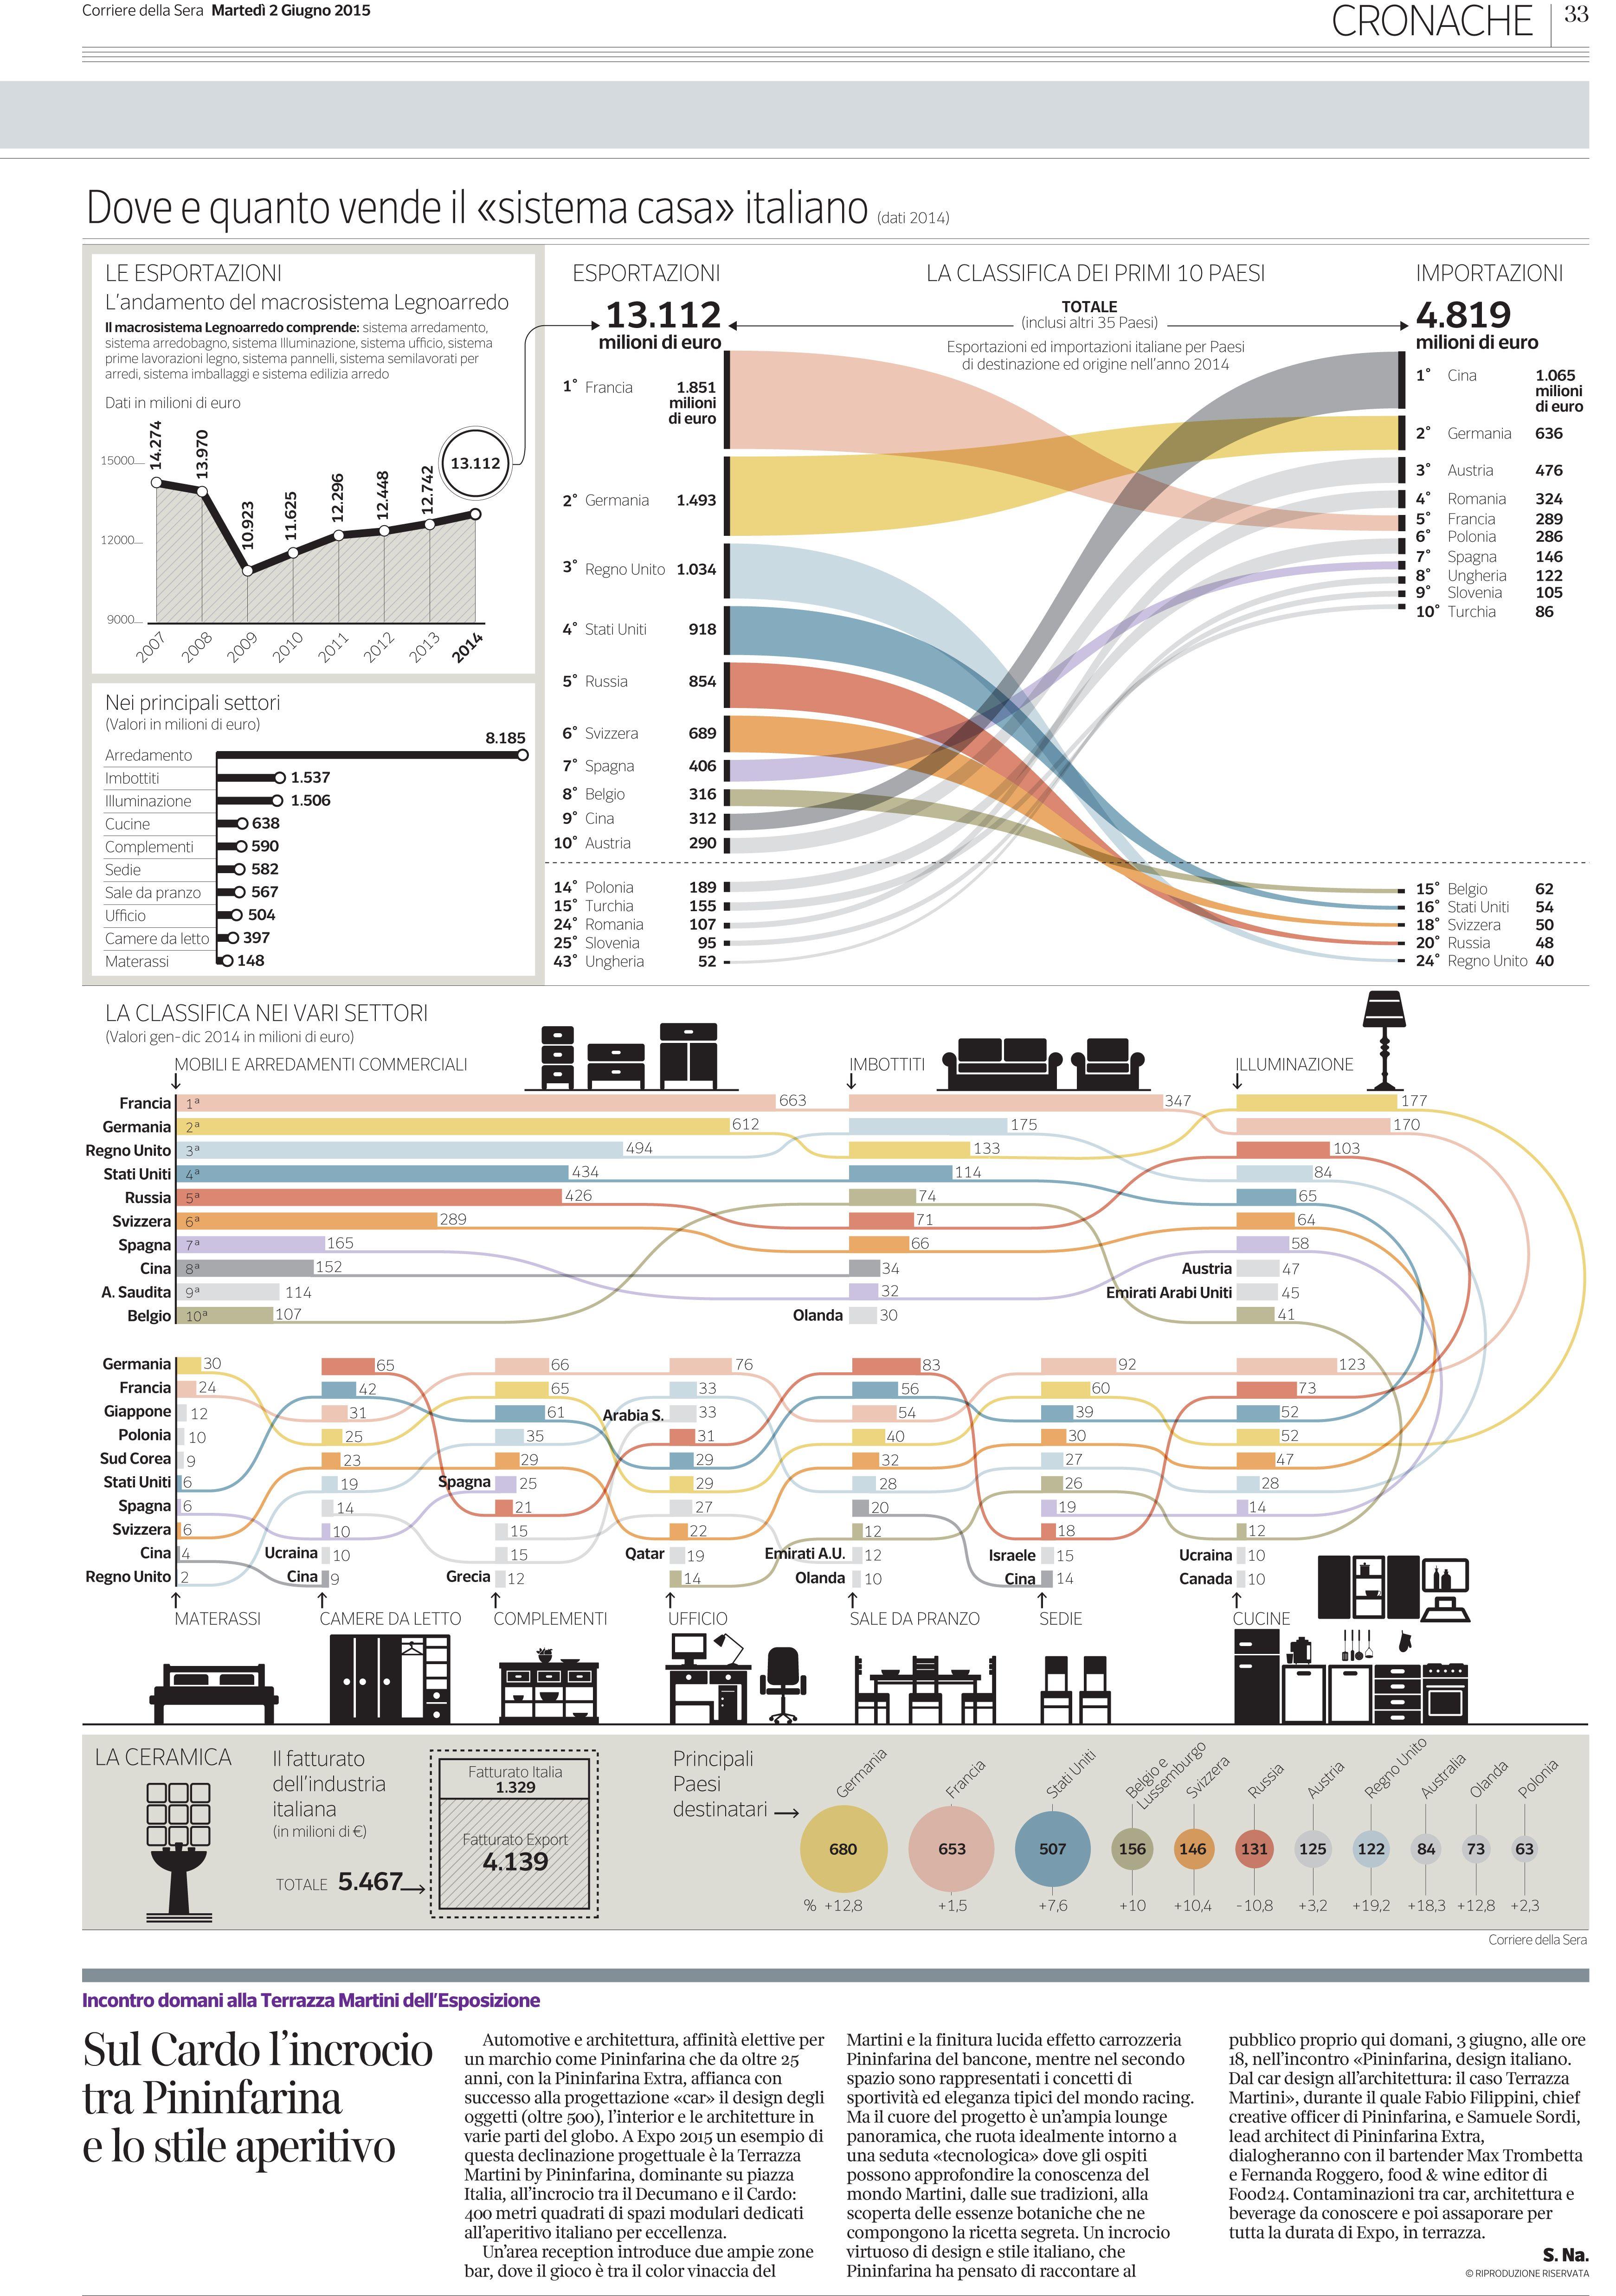 portfolio of the week sabina castagnaviz edward tufte creative infographic charts and graphs [ 3483 x 4949 Pixel ]